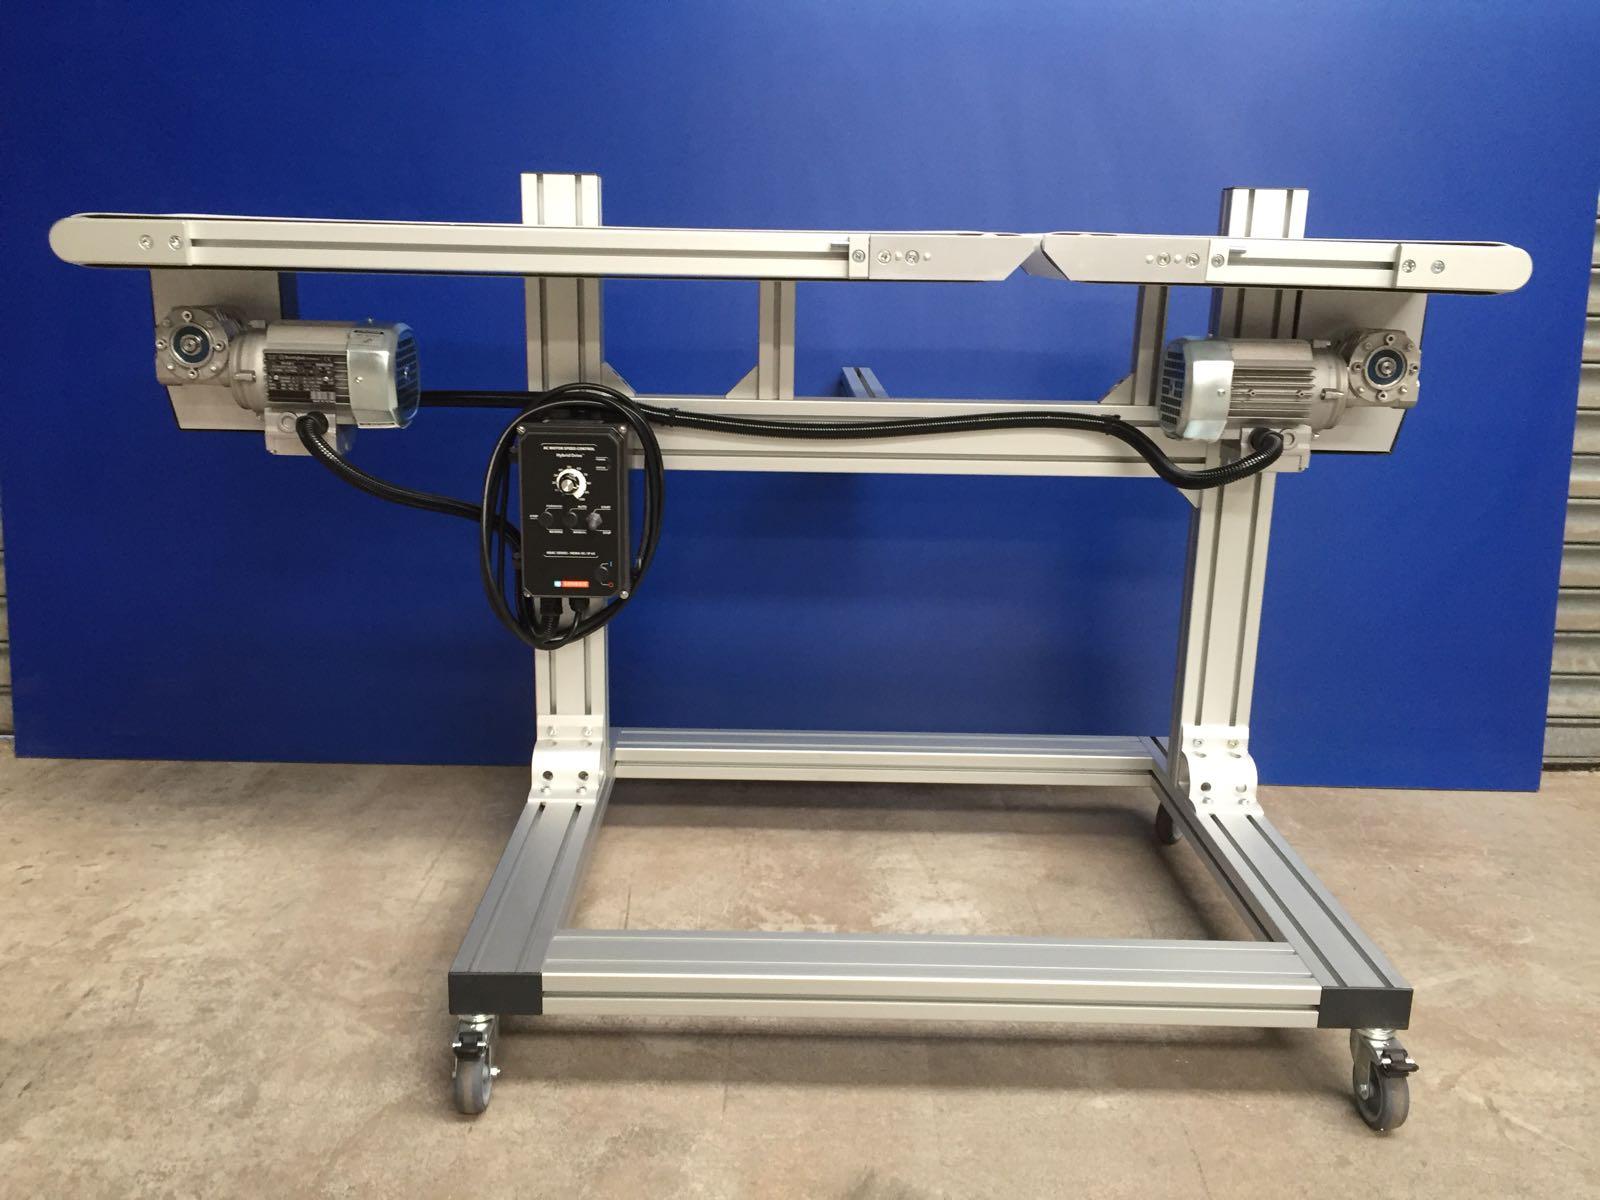 LMI Solutions, conveyor